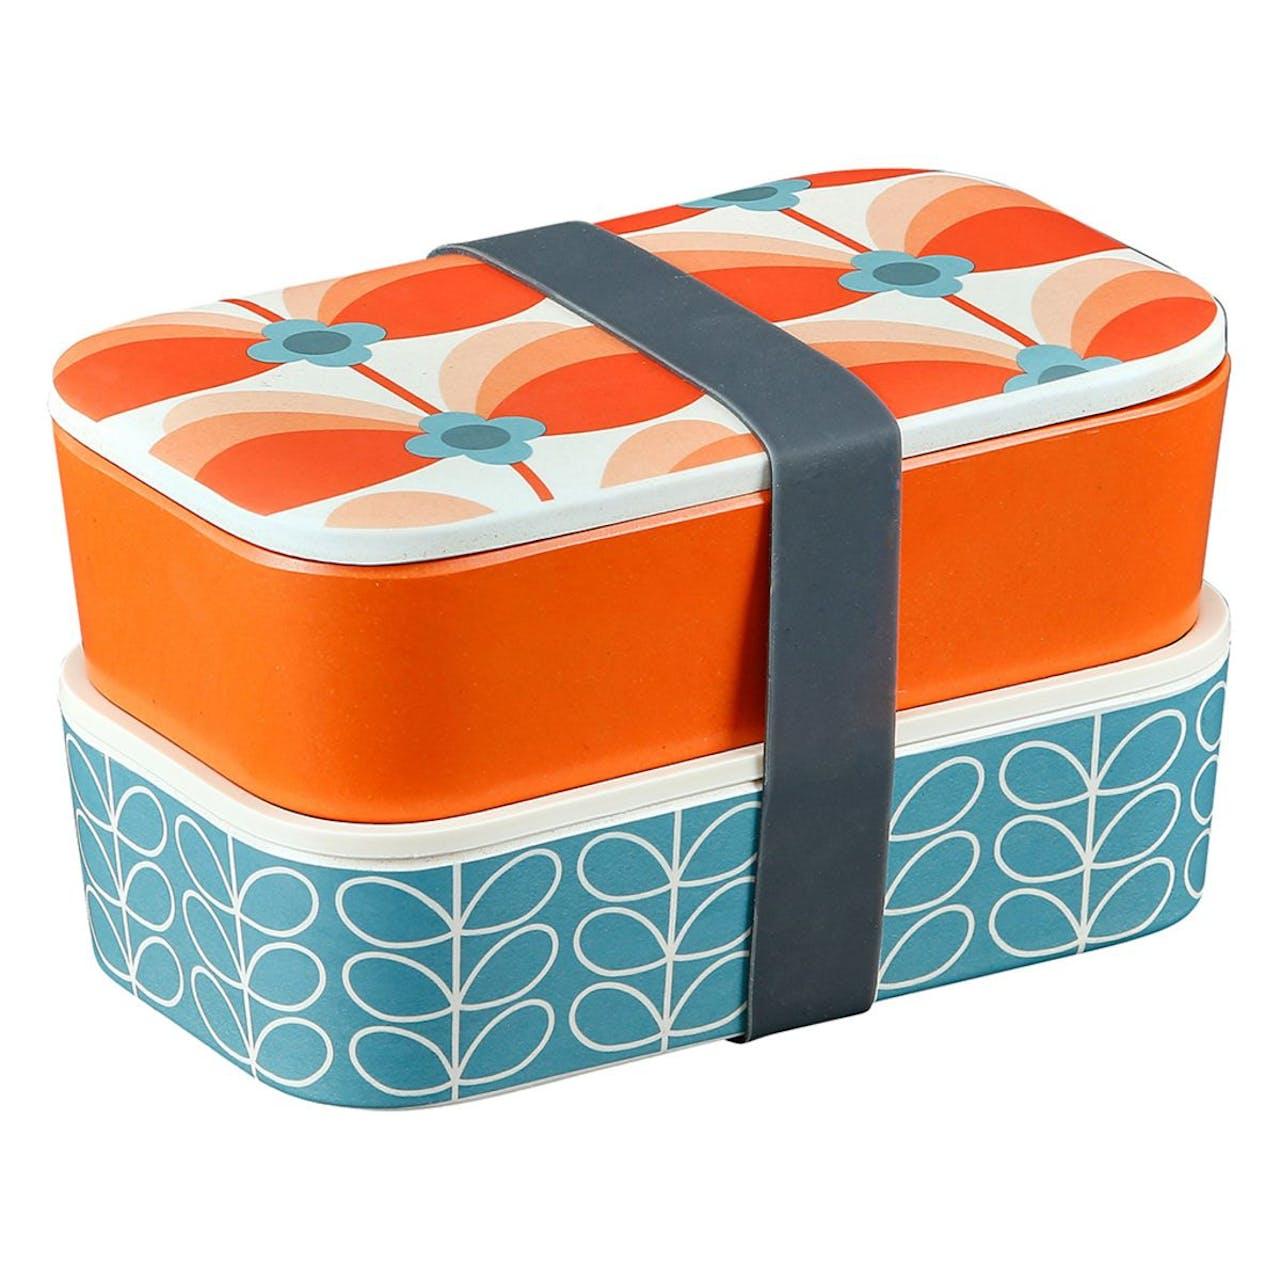 Orla Kiely Butterfly Stem Bubblegum Lunch Box